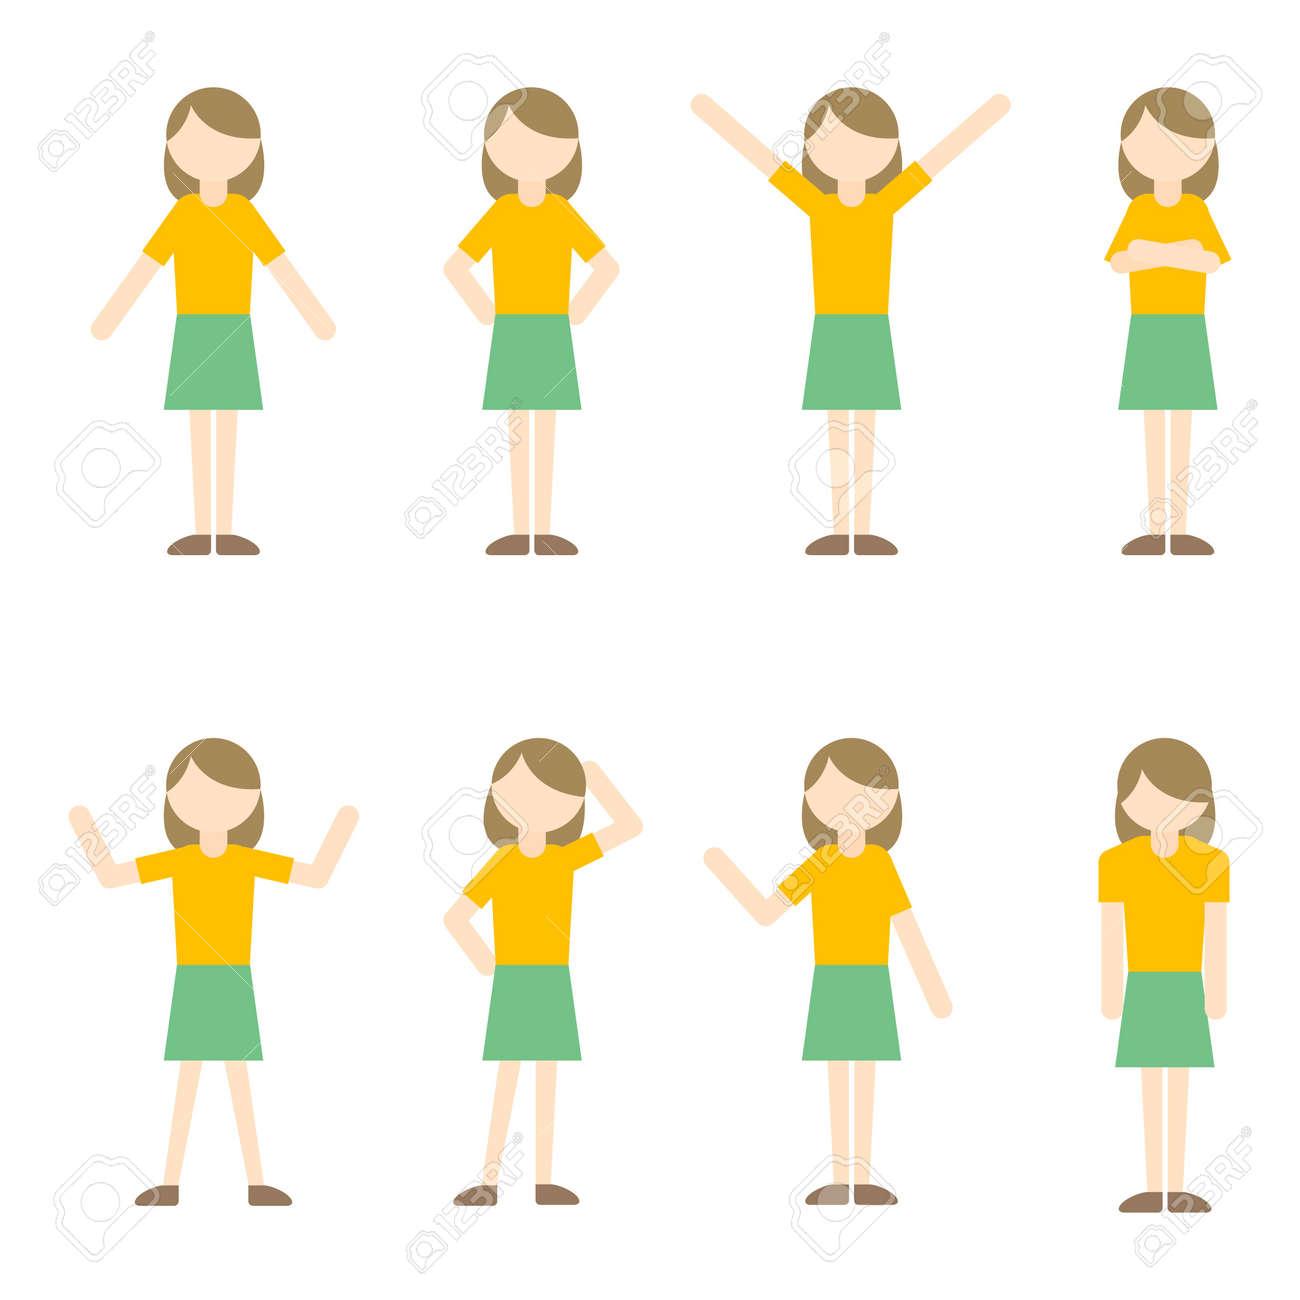 Flat Icon Person Mom Woman - 168585544